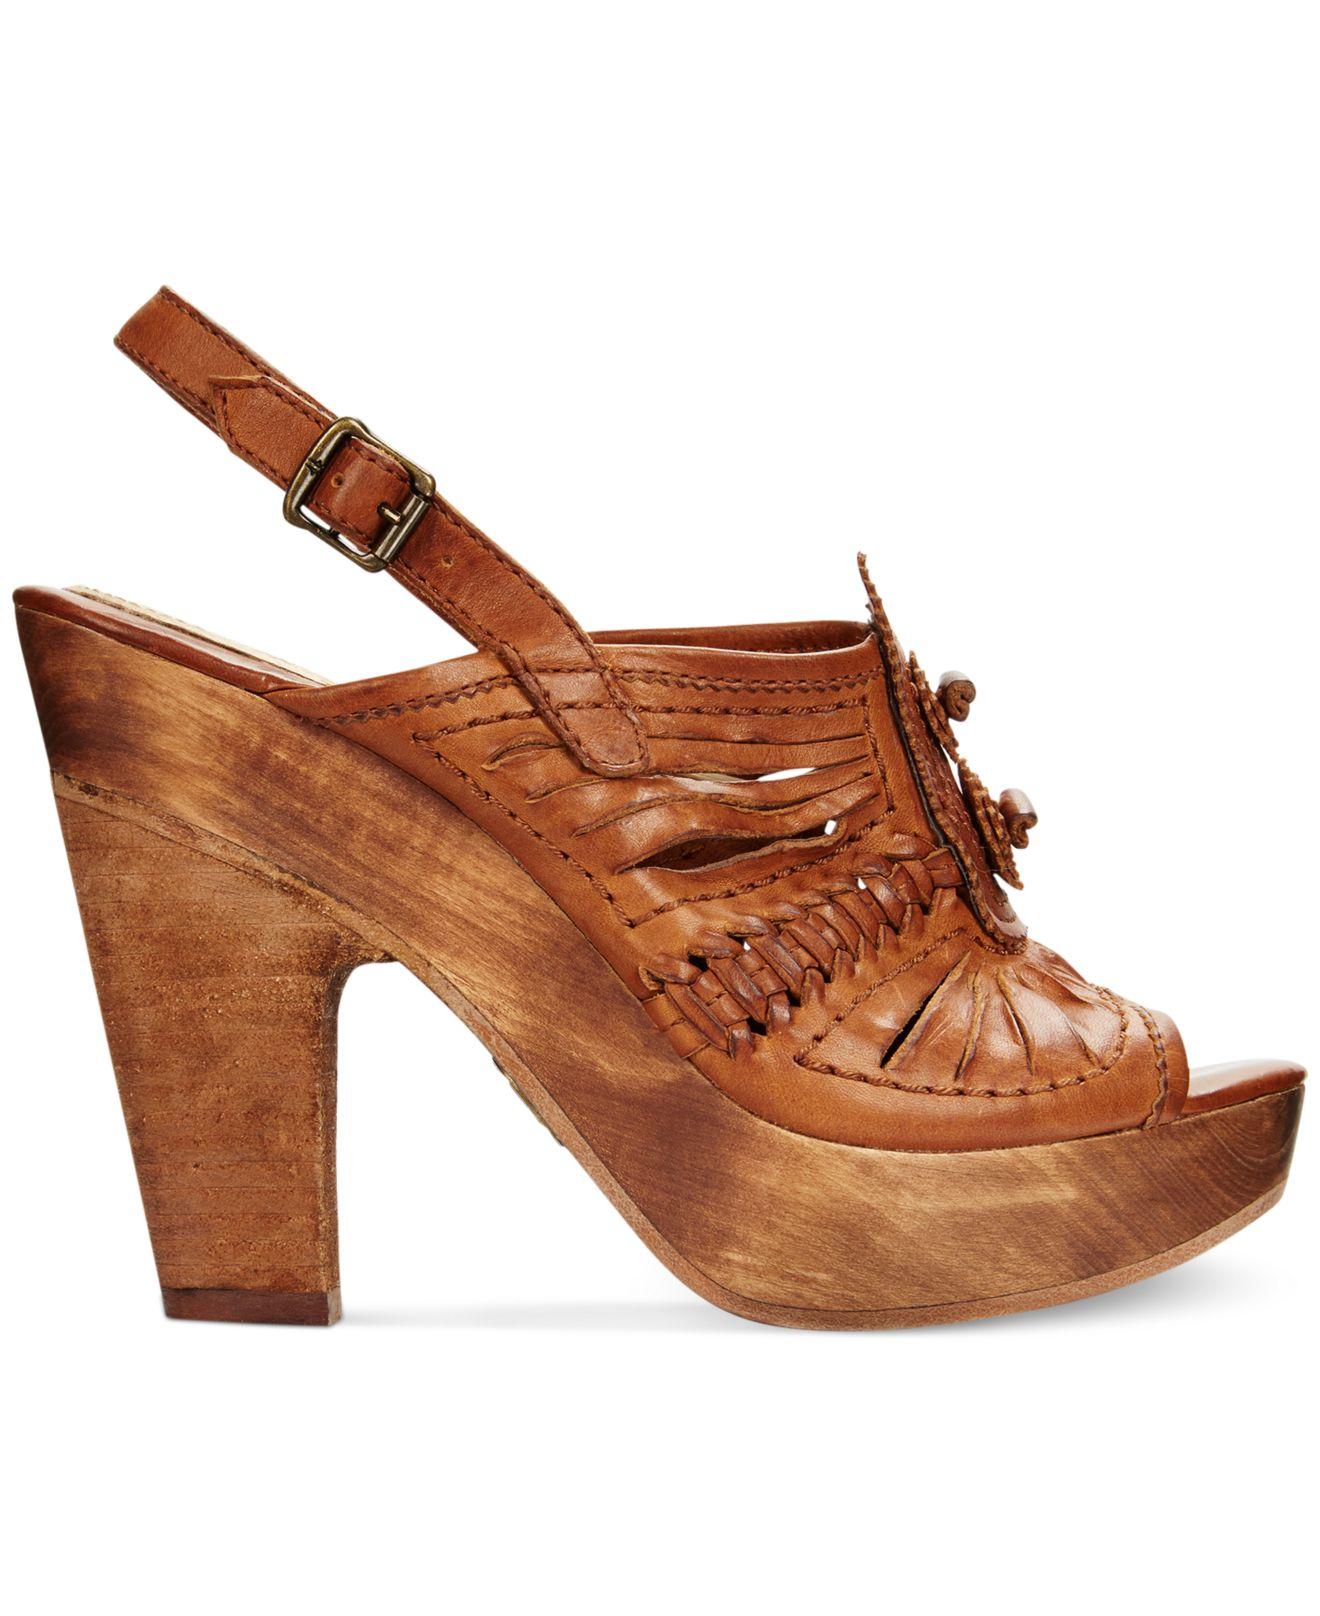 Frye Leather Platform Sandals fashionable cheap price excellent cheap price OdMHGGQh